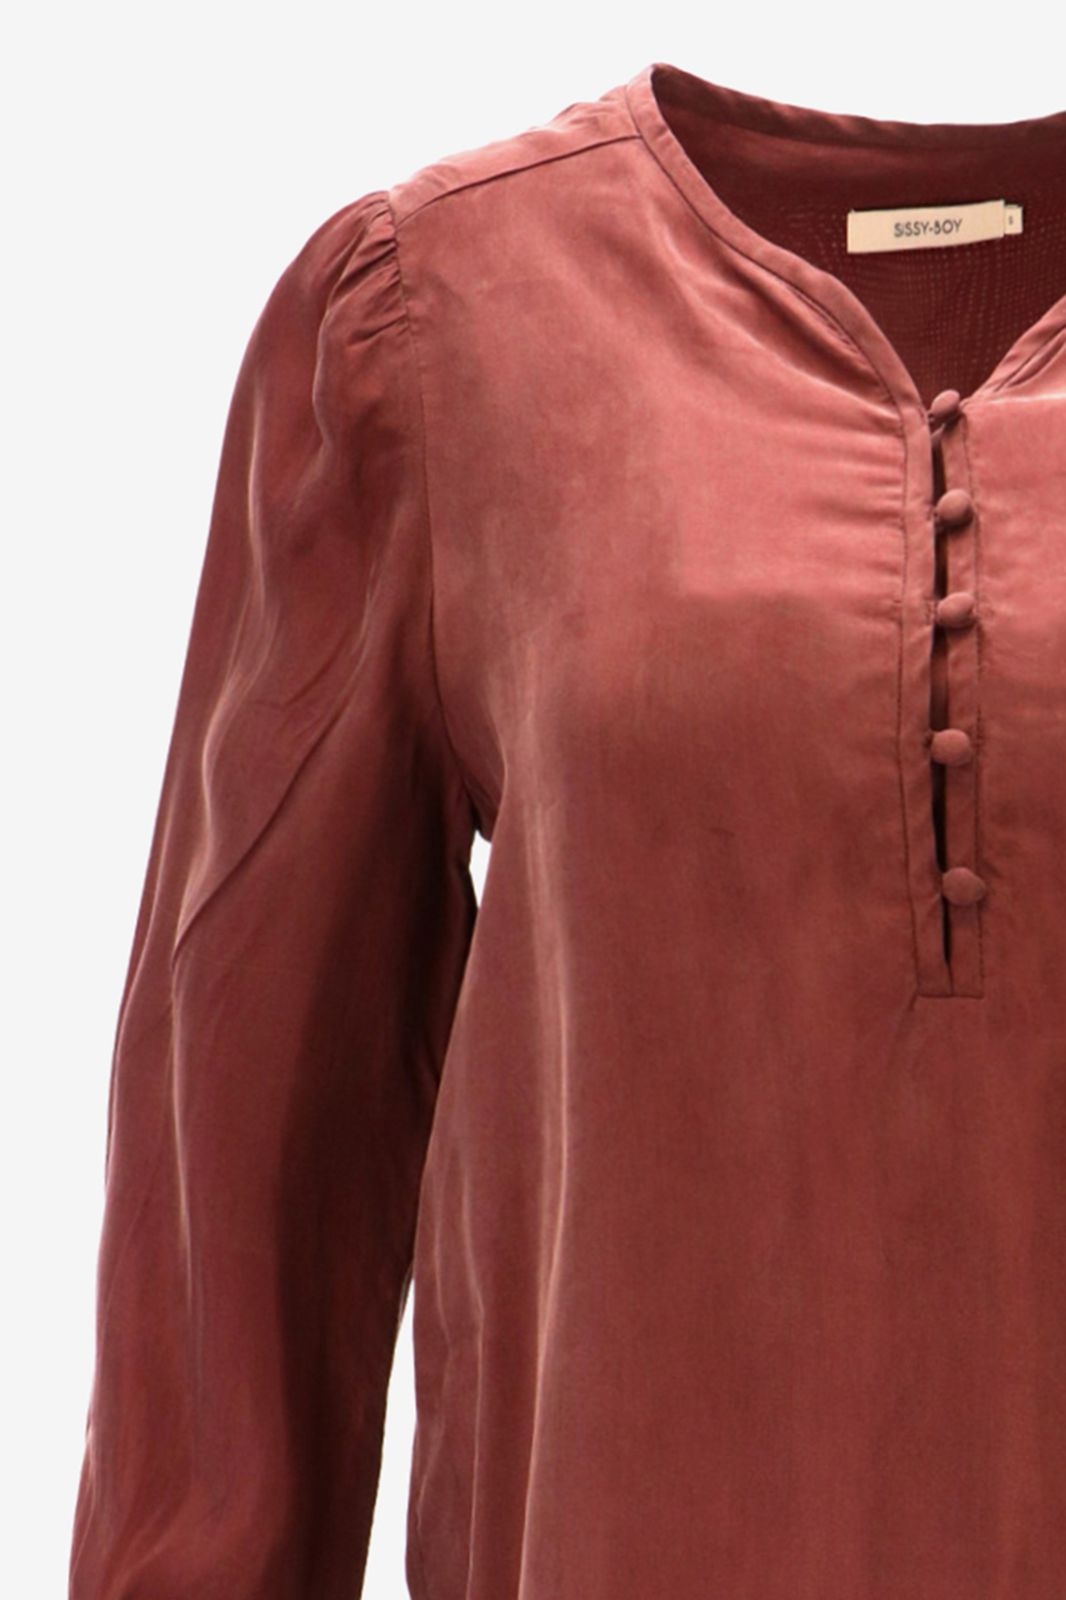 Aubergine cupro blouse - Dames | Sissy-Boy